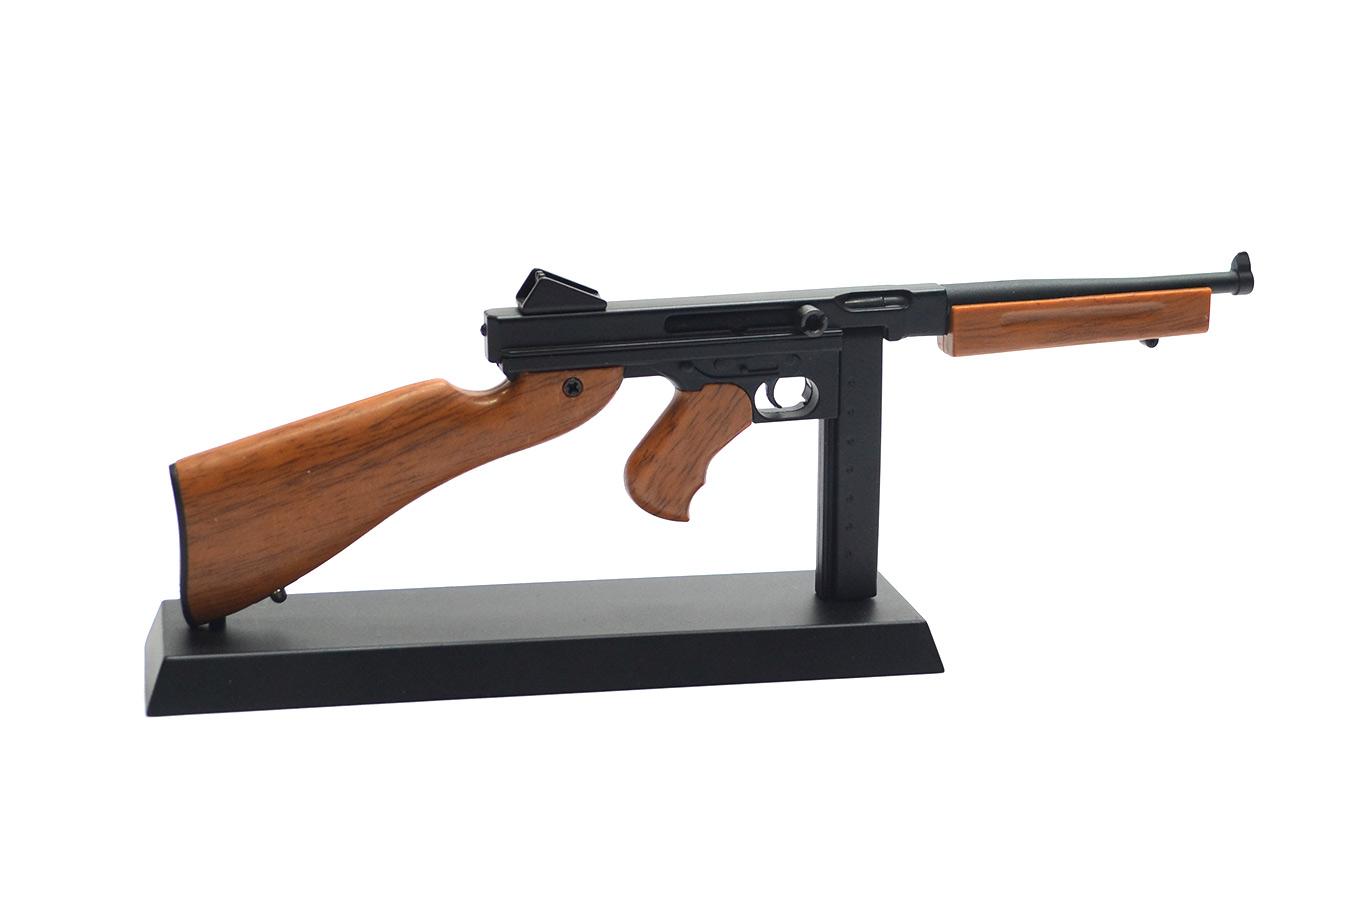 Пистолет-пулемёт Томпсона изображение 1